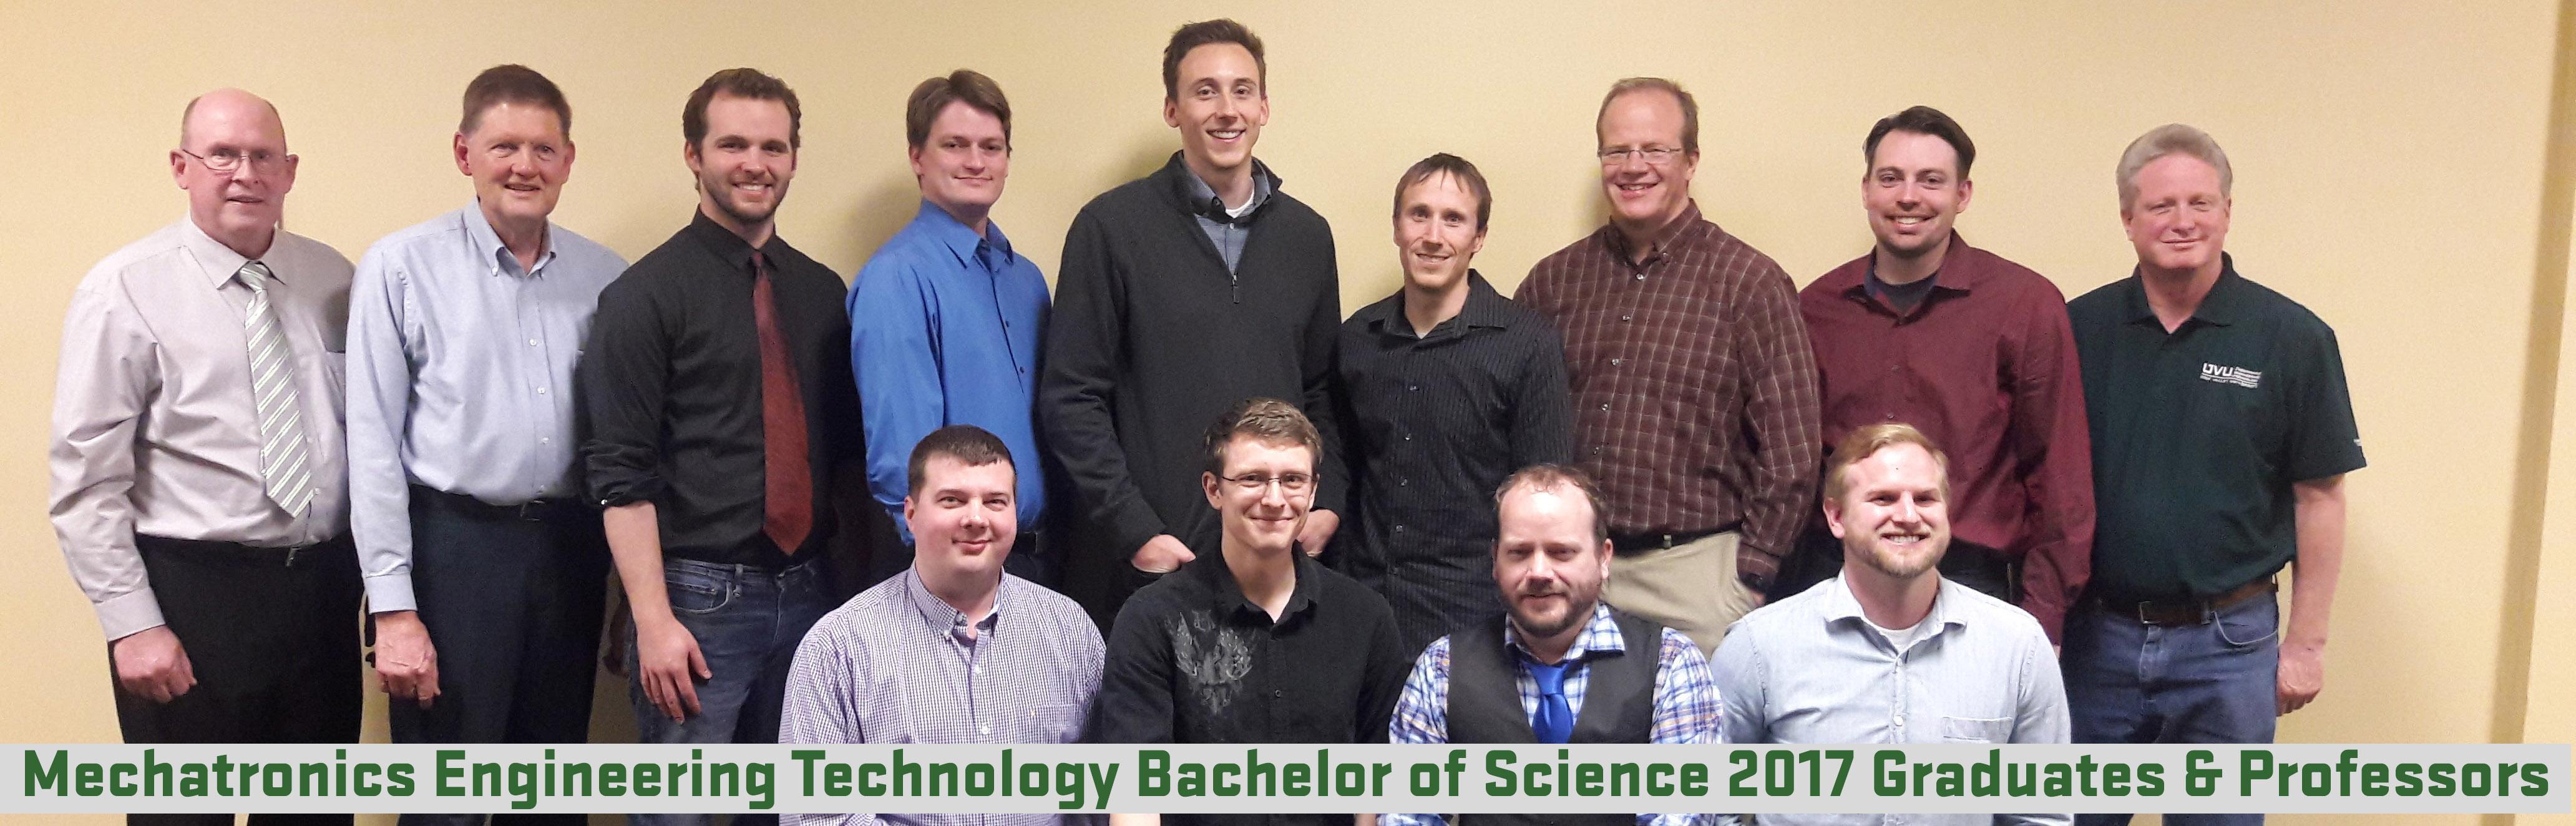 Mechatronics Engineering Technology Bachelor of Science 2017 Graduates & Professors